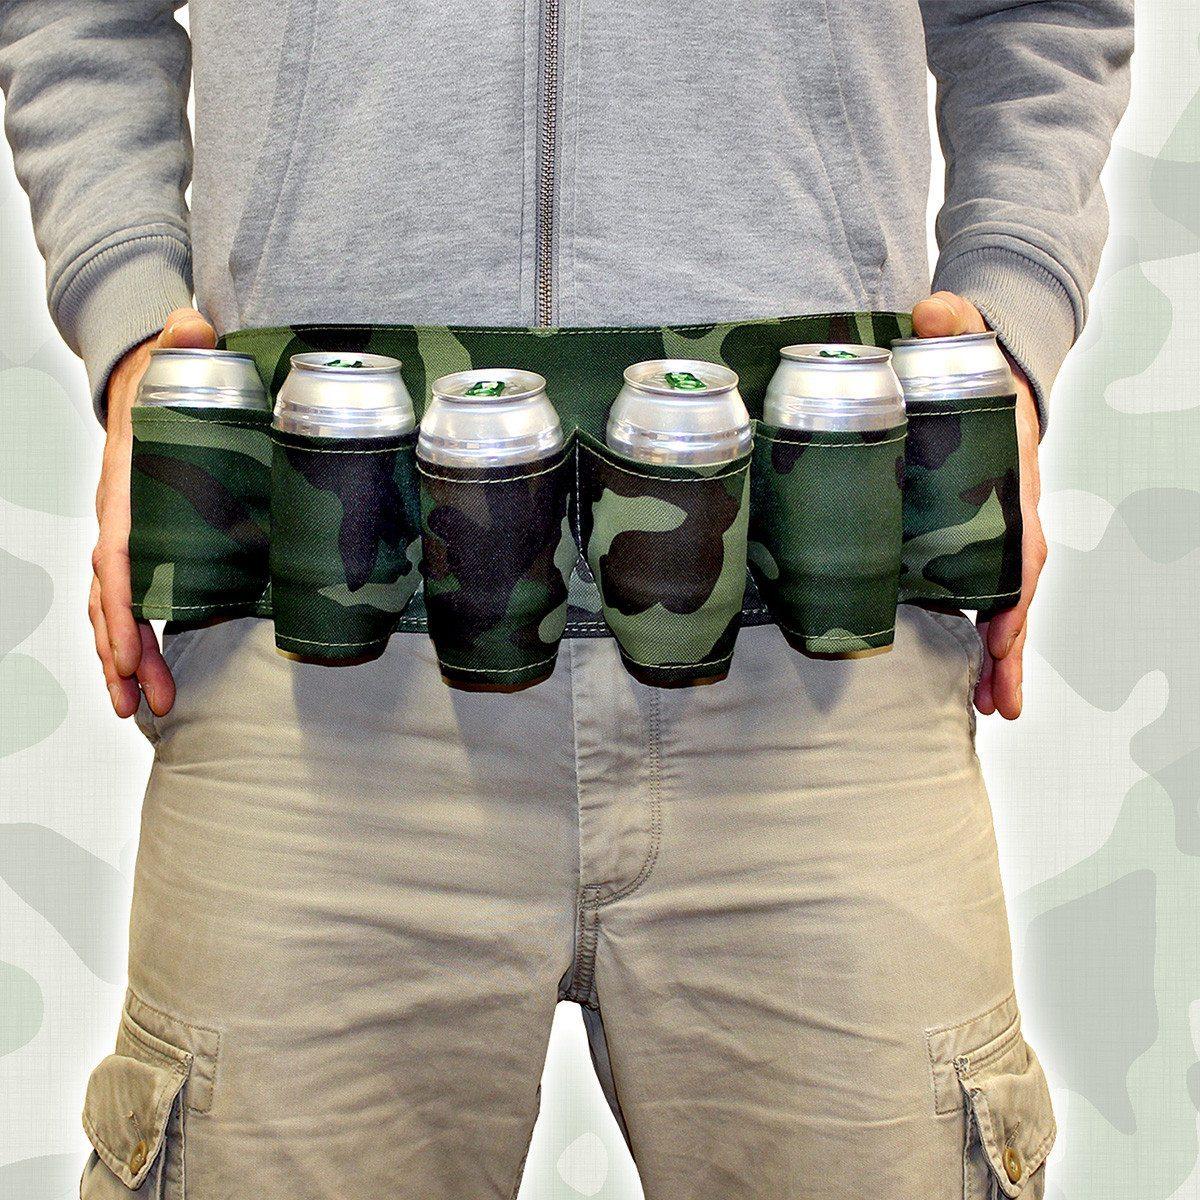 Für Kampftrinker: Der ultimative 6-Pack-Gürtel